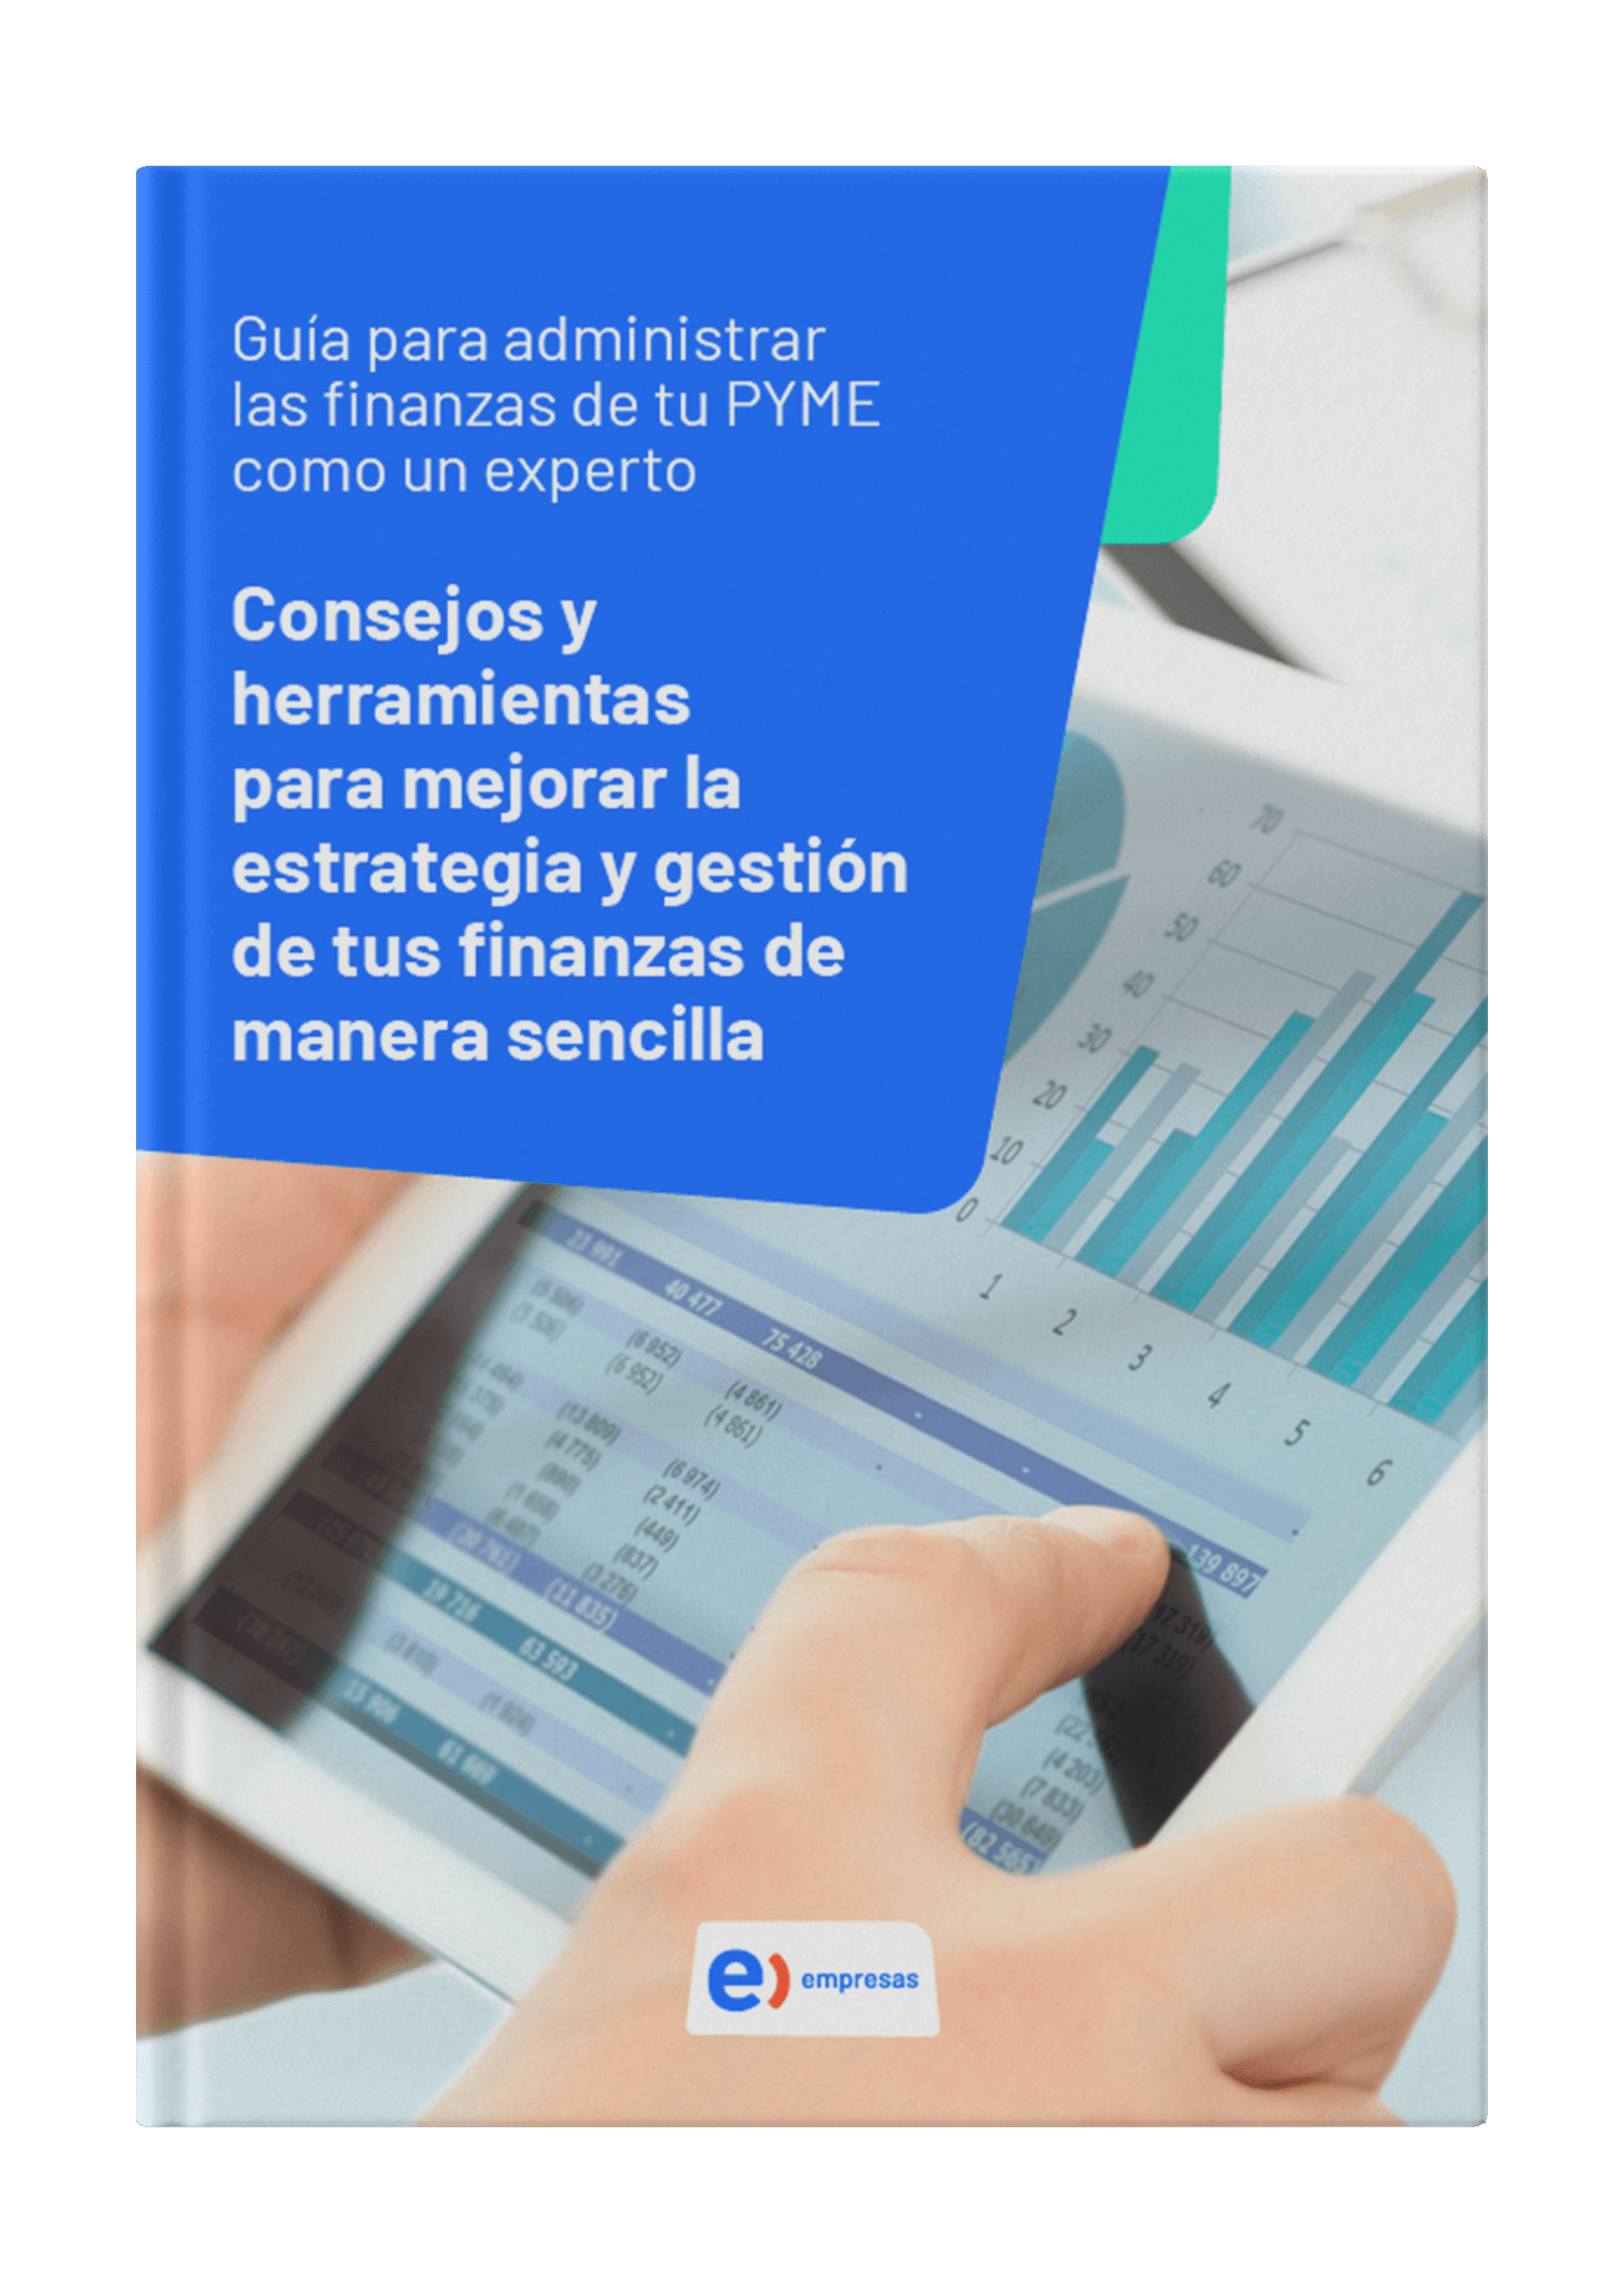 ENT - Guía para administrar las finanzas de tu PYME como un experto - Portada (1)